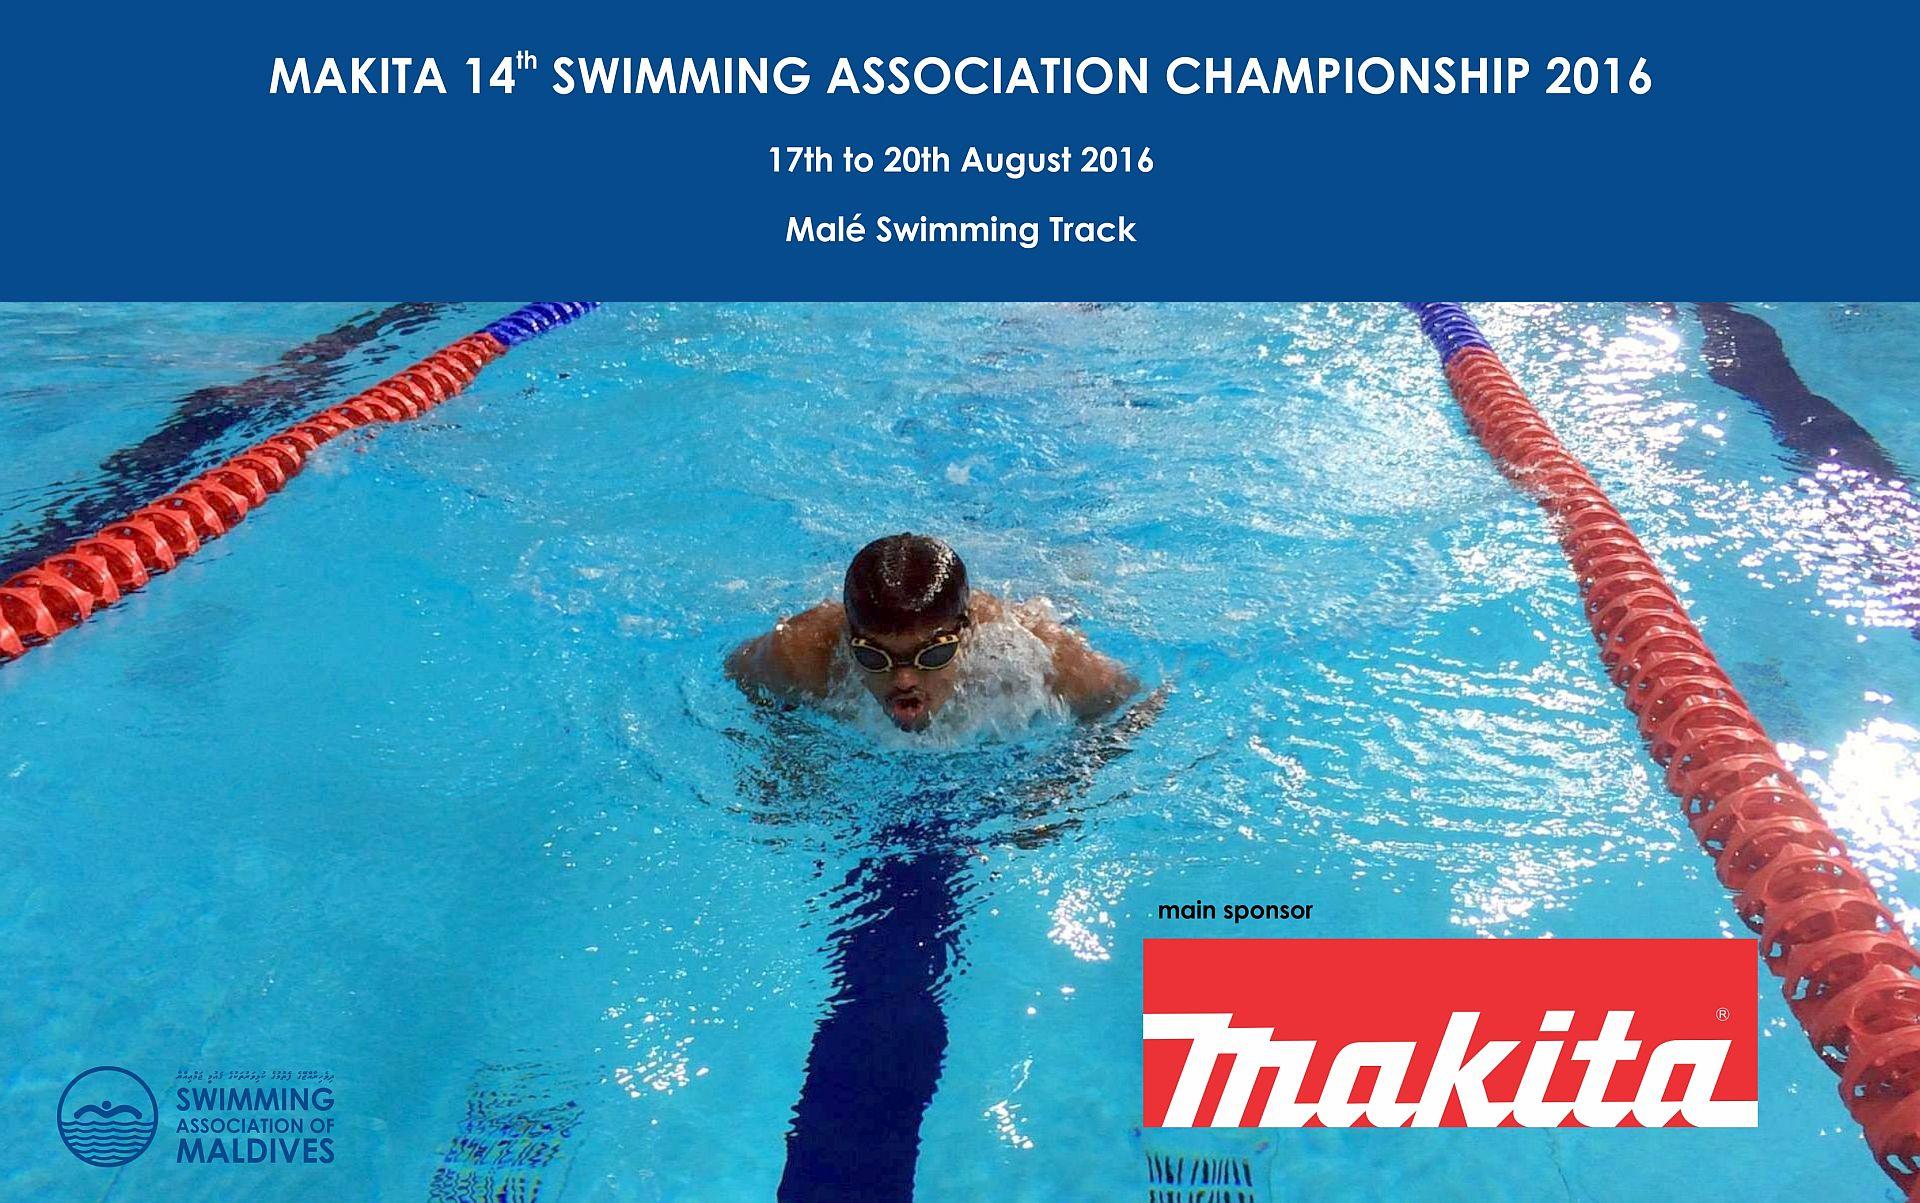 Makita 14th Swimming Association Championship